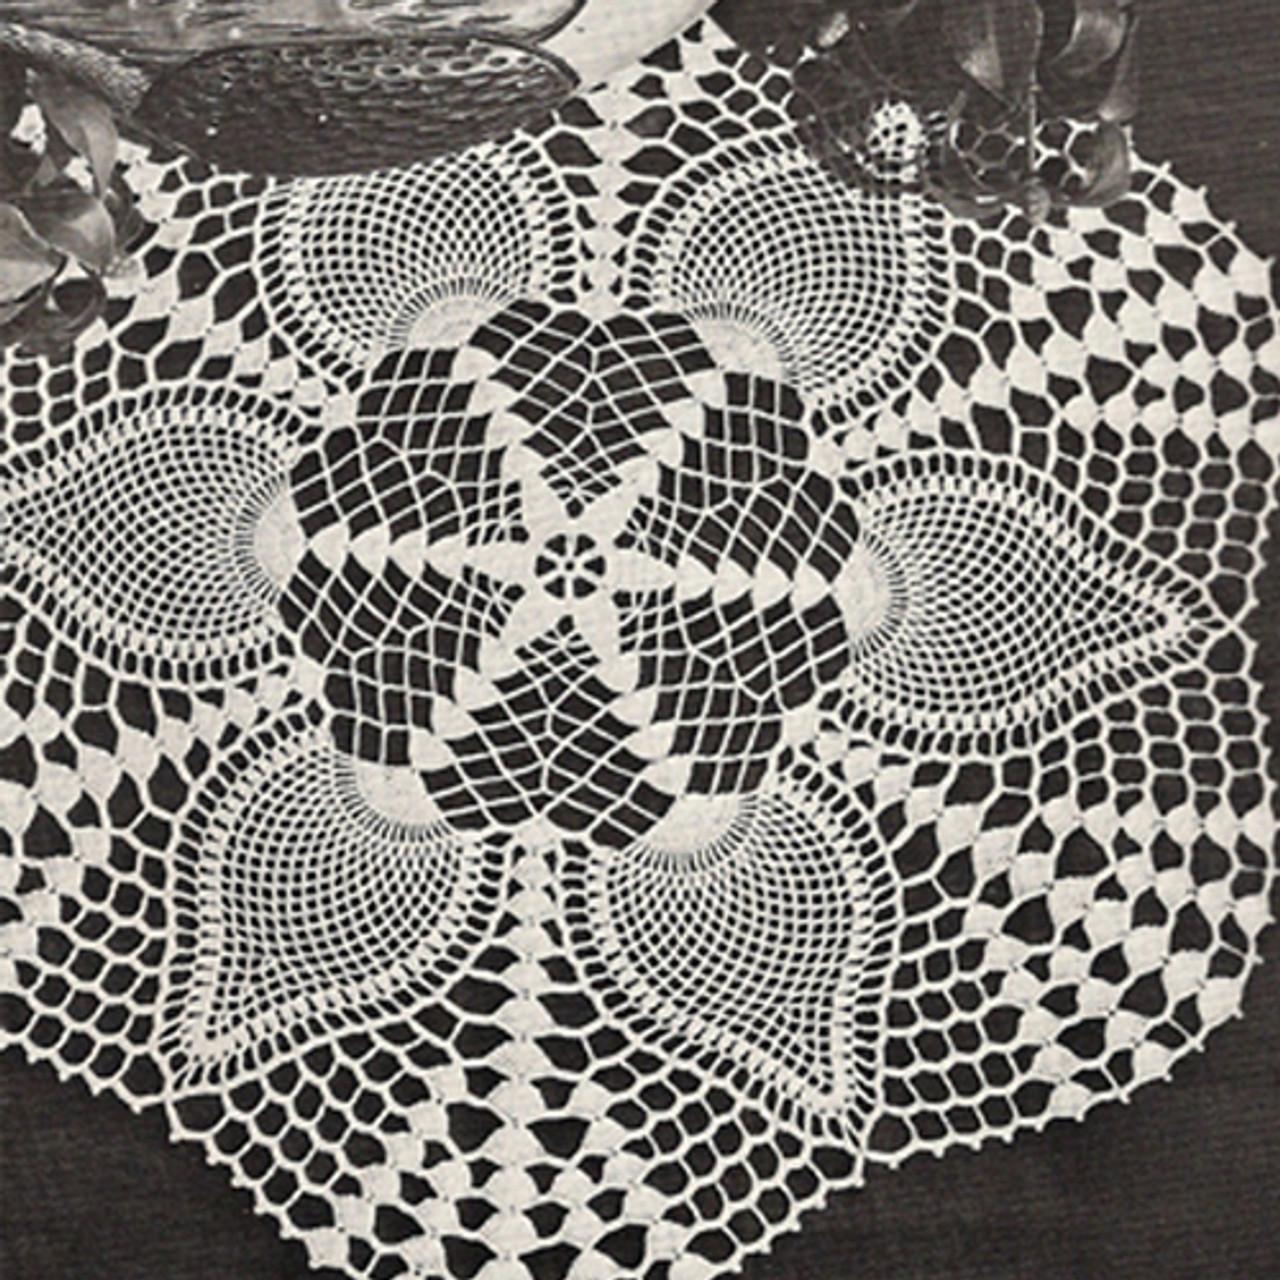 Crochet Pineapple Shell Doily Crochet Pattern